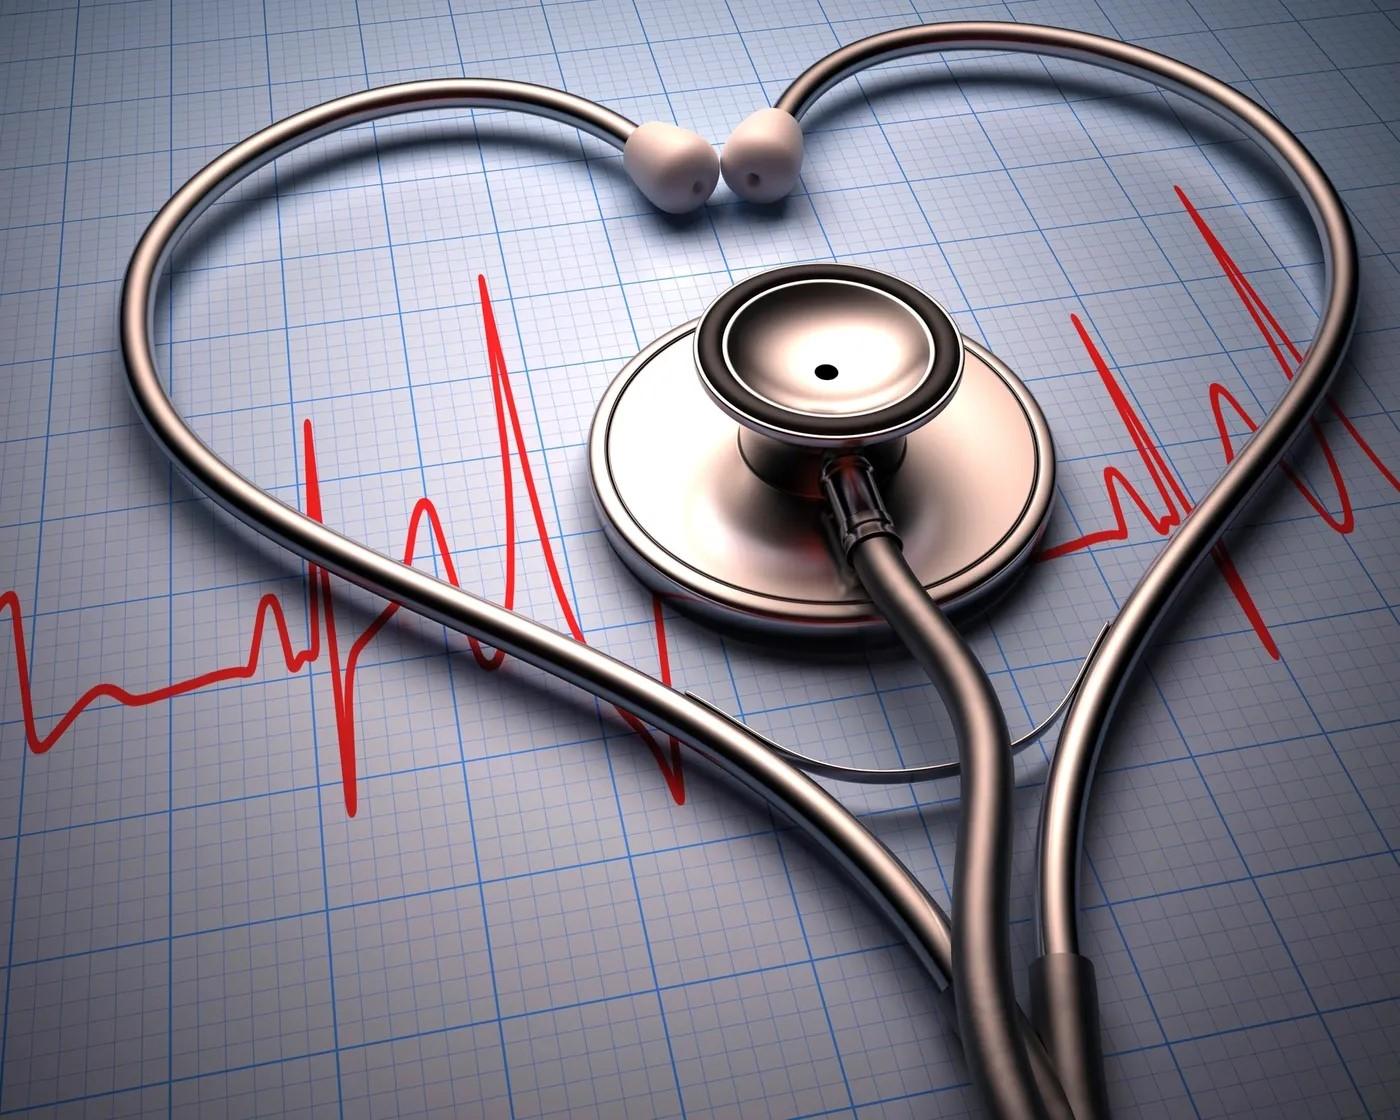 Premier Care Medical Services PLLC